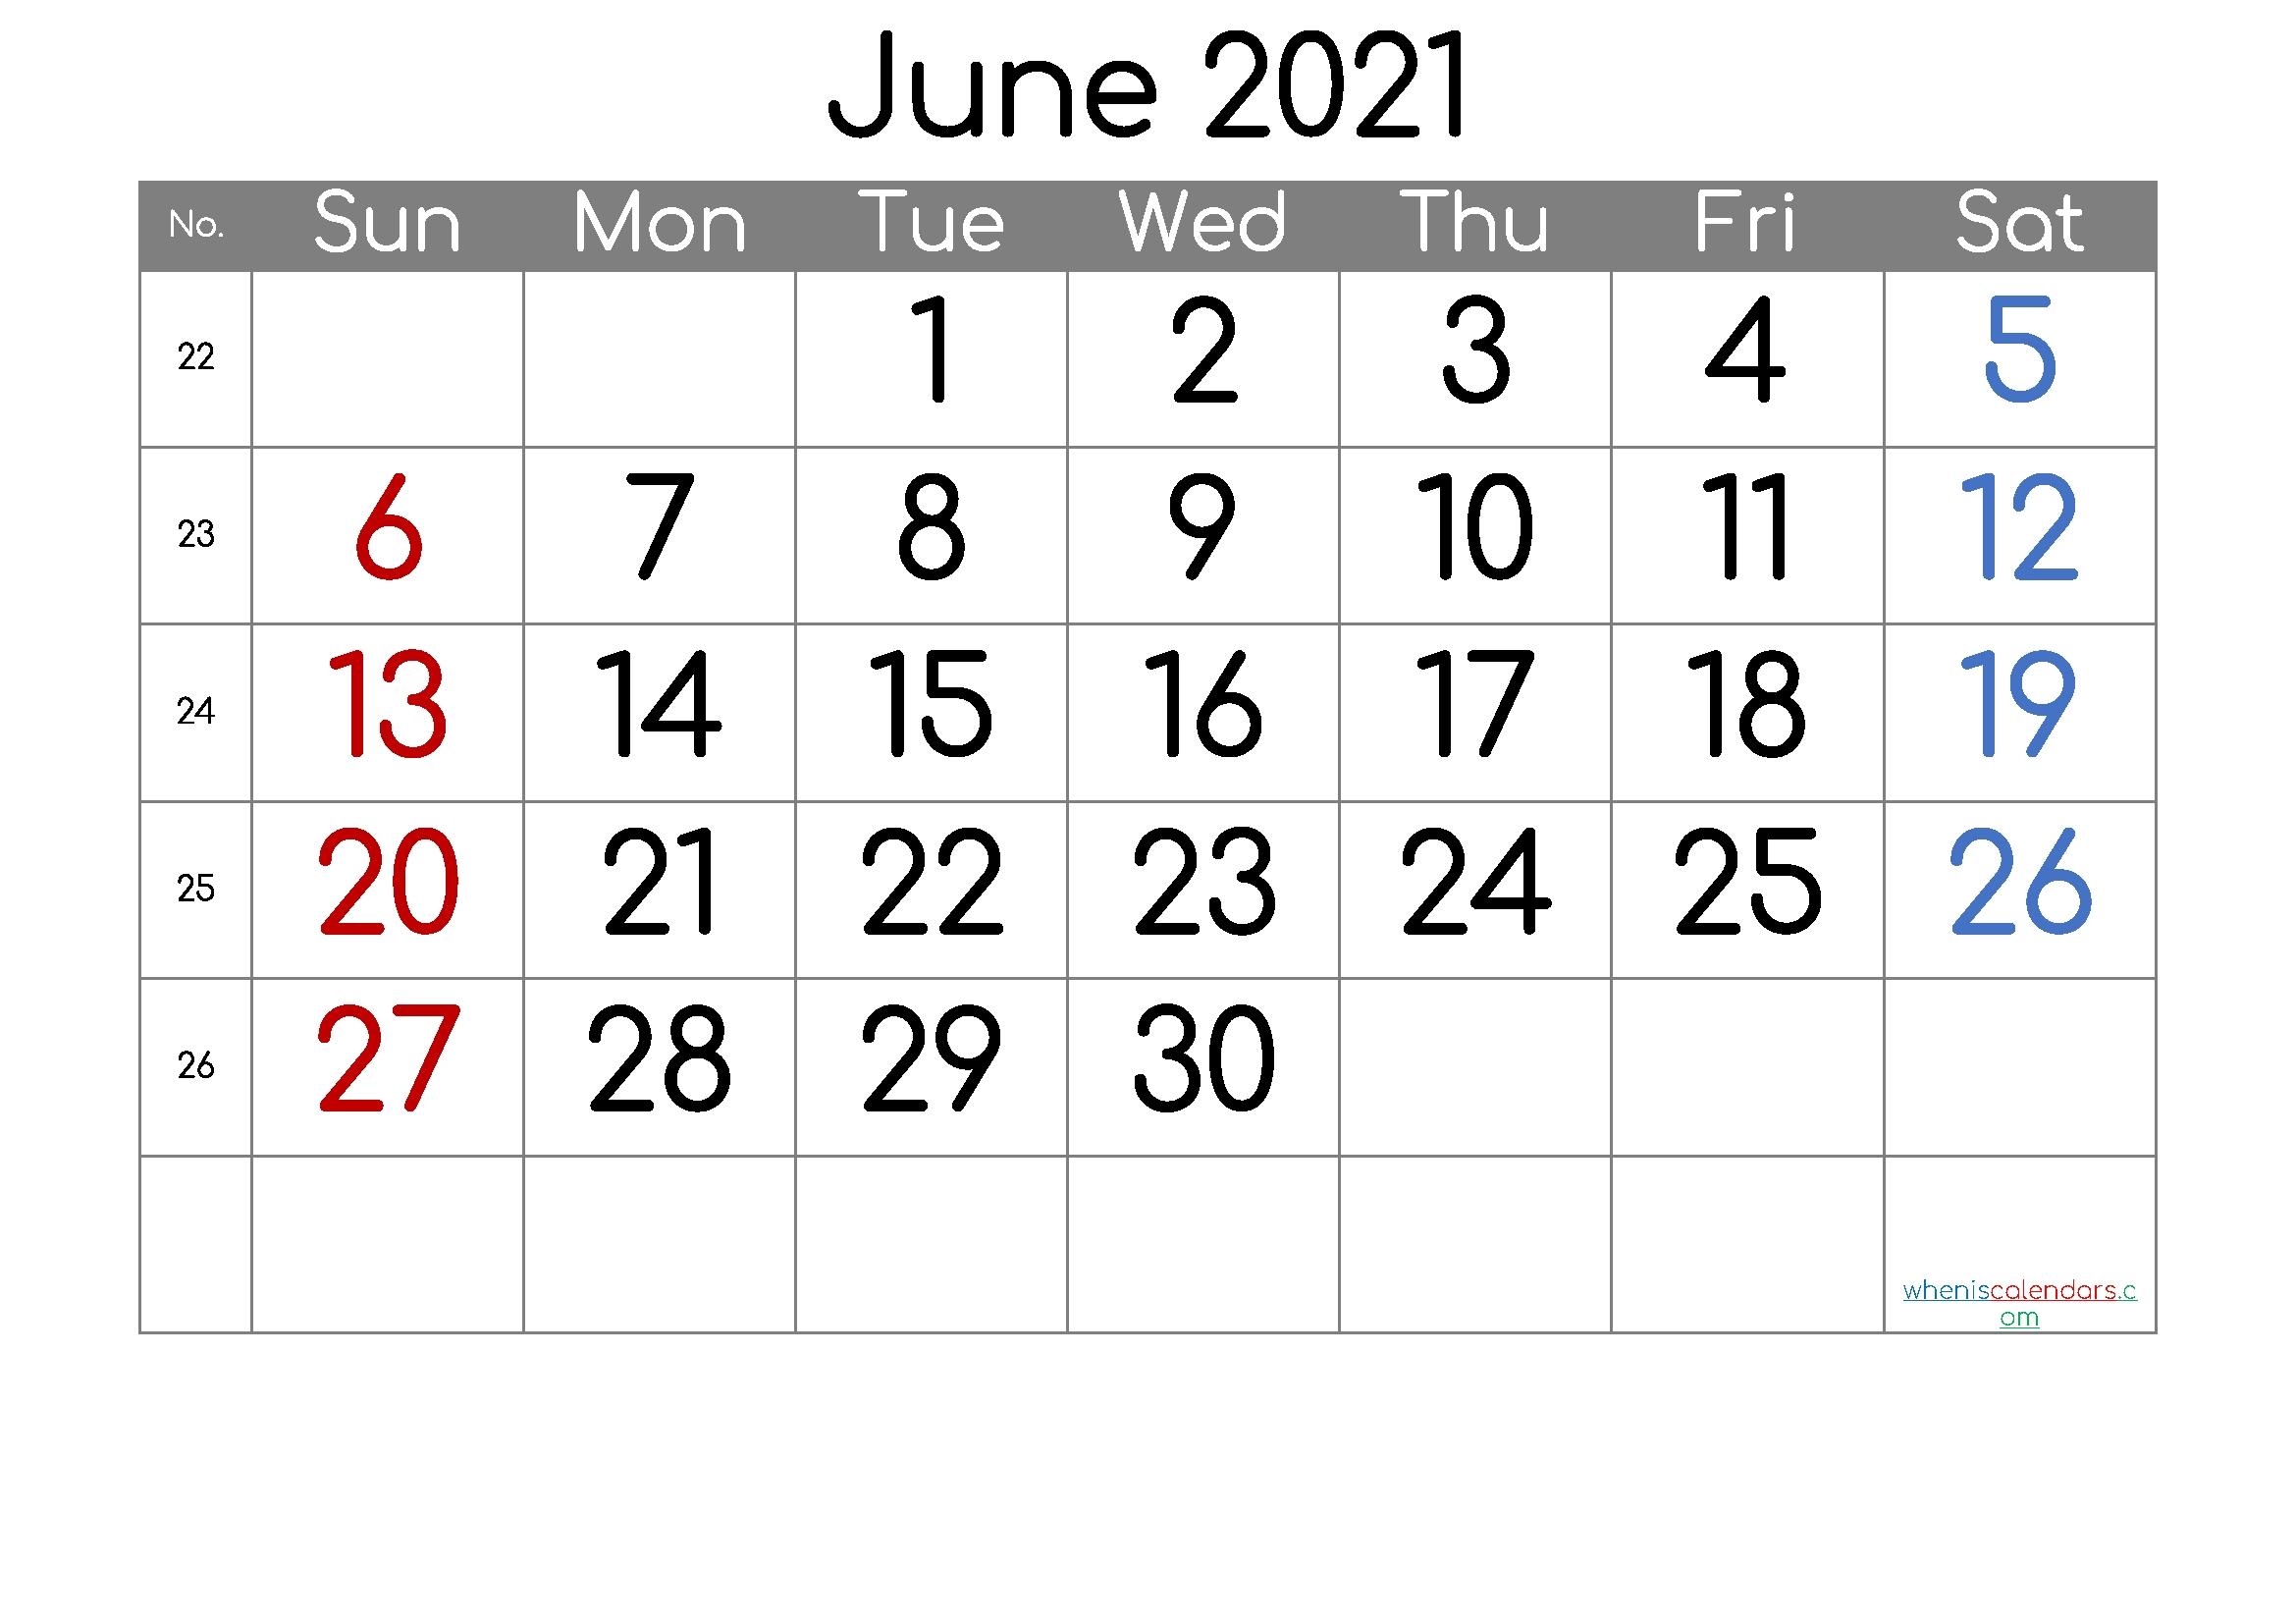 Free Printable June 2021 Calendar (Premium) In 2020-4 Inch By 7 Inch 2021 .Pdf Calendar